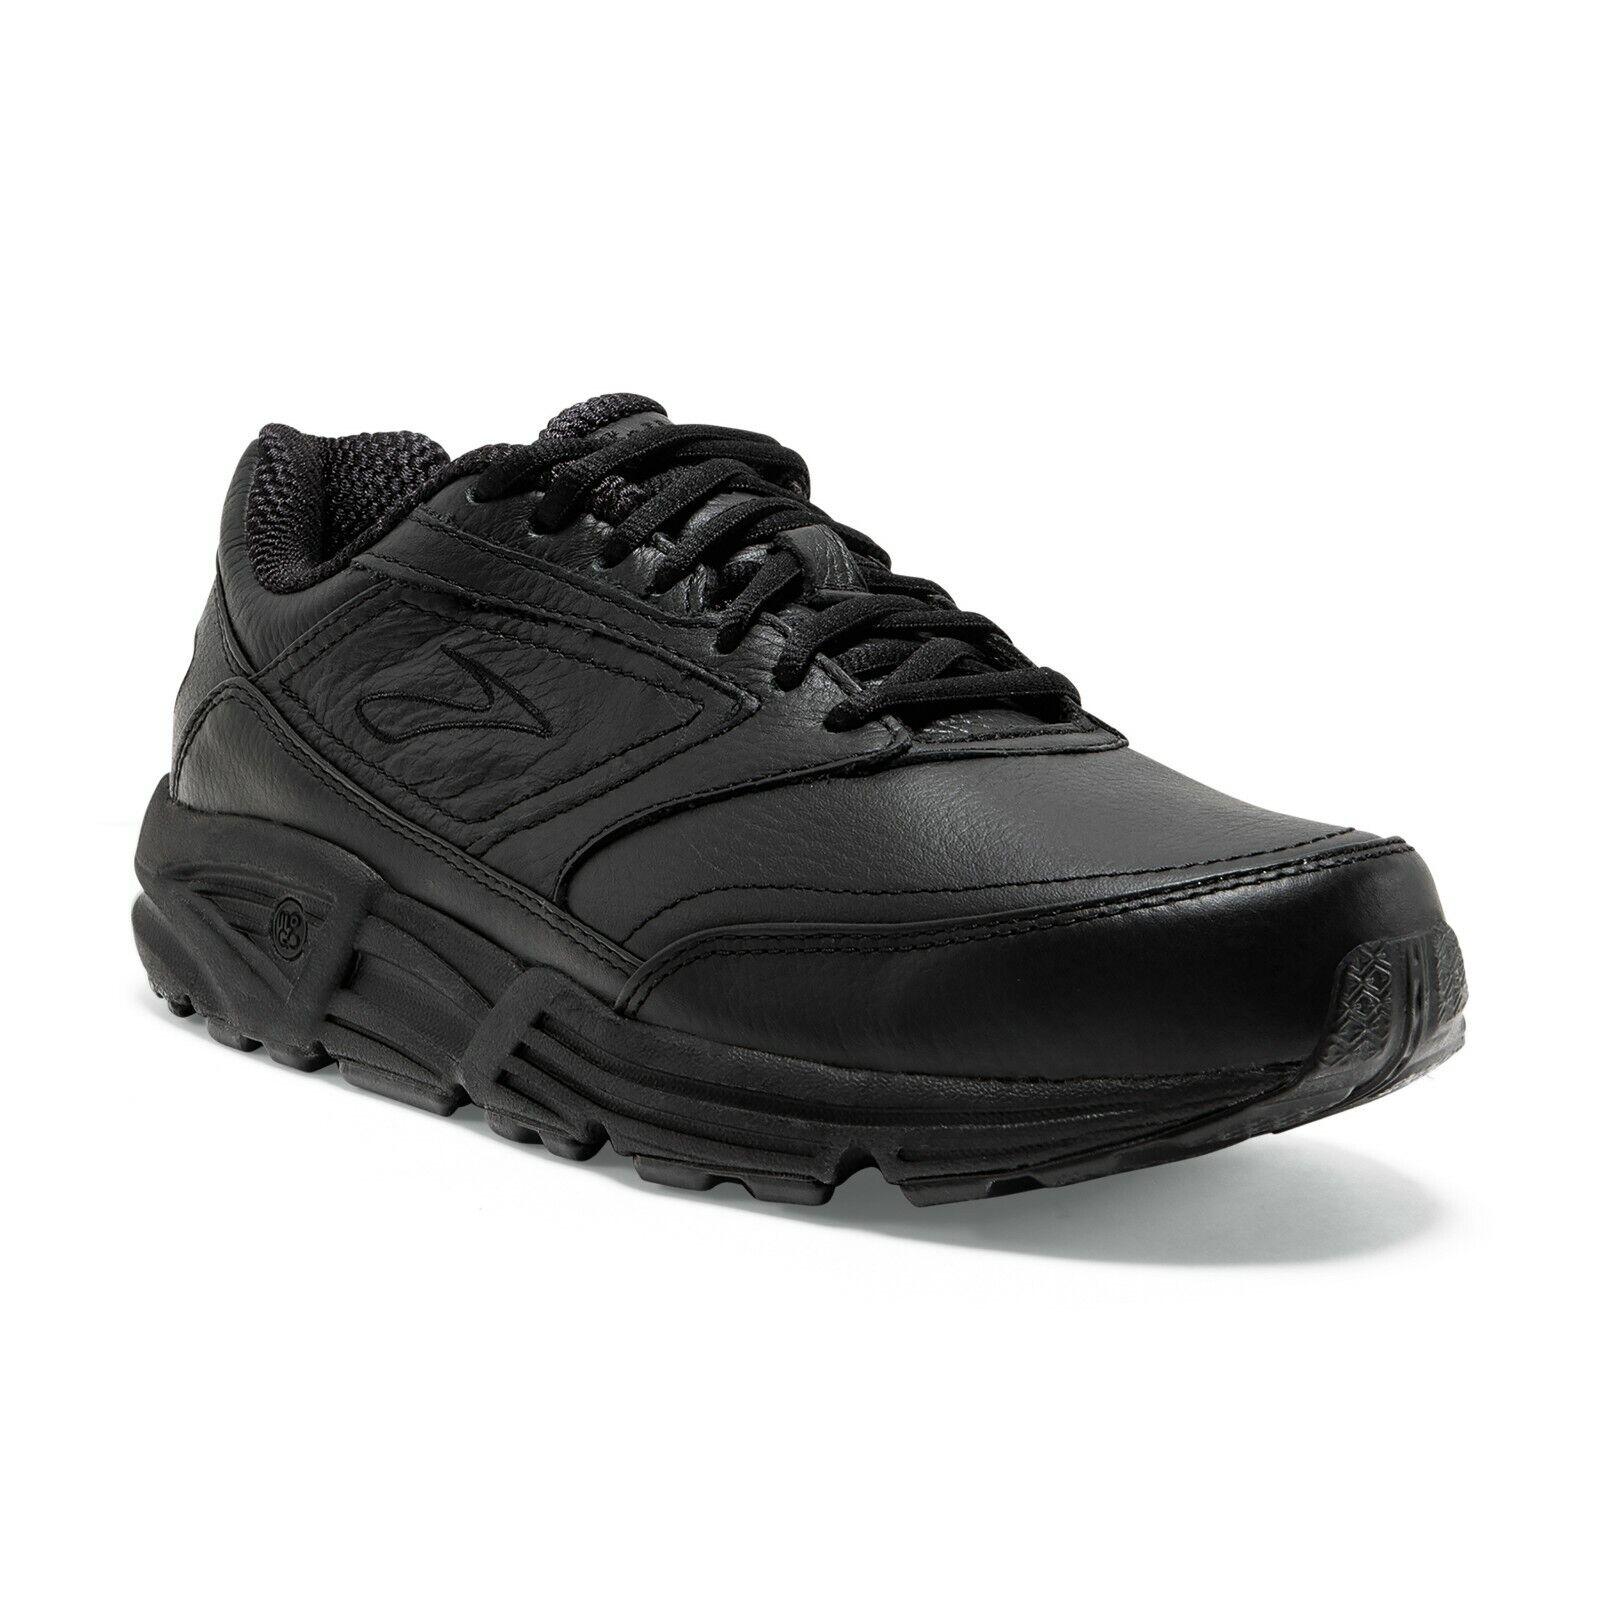 Brooks Addiction Walker Mens Walking scarpe (4E) (nero)SAVE       grandi risparmi